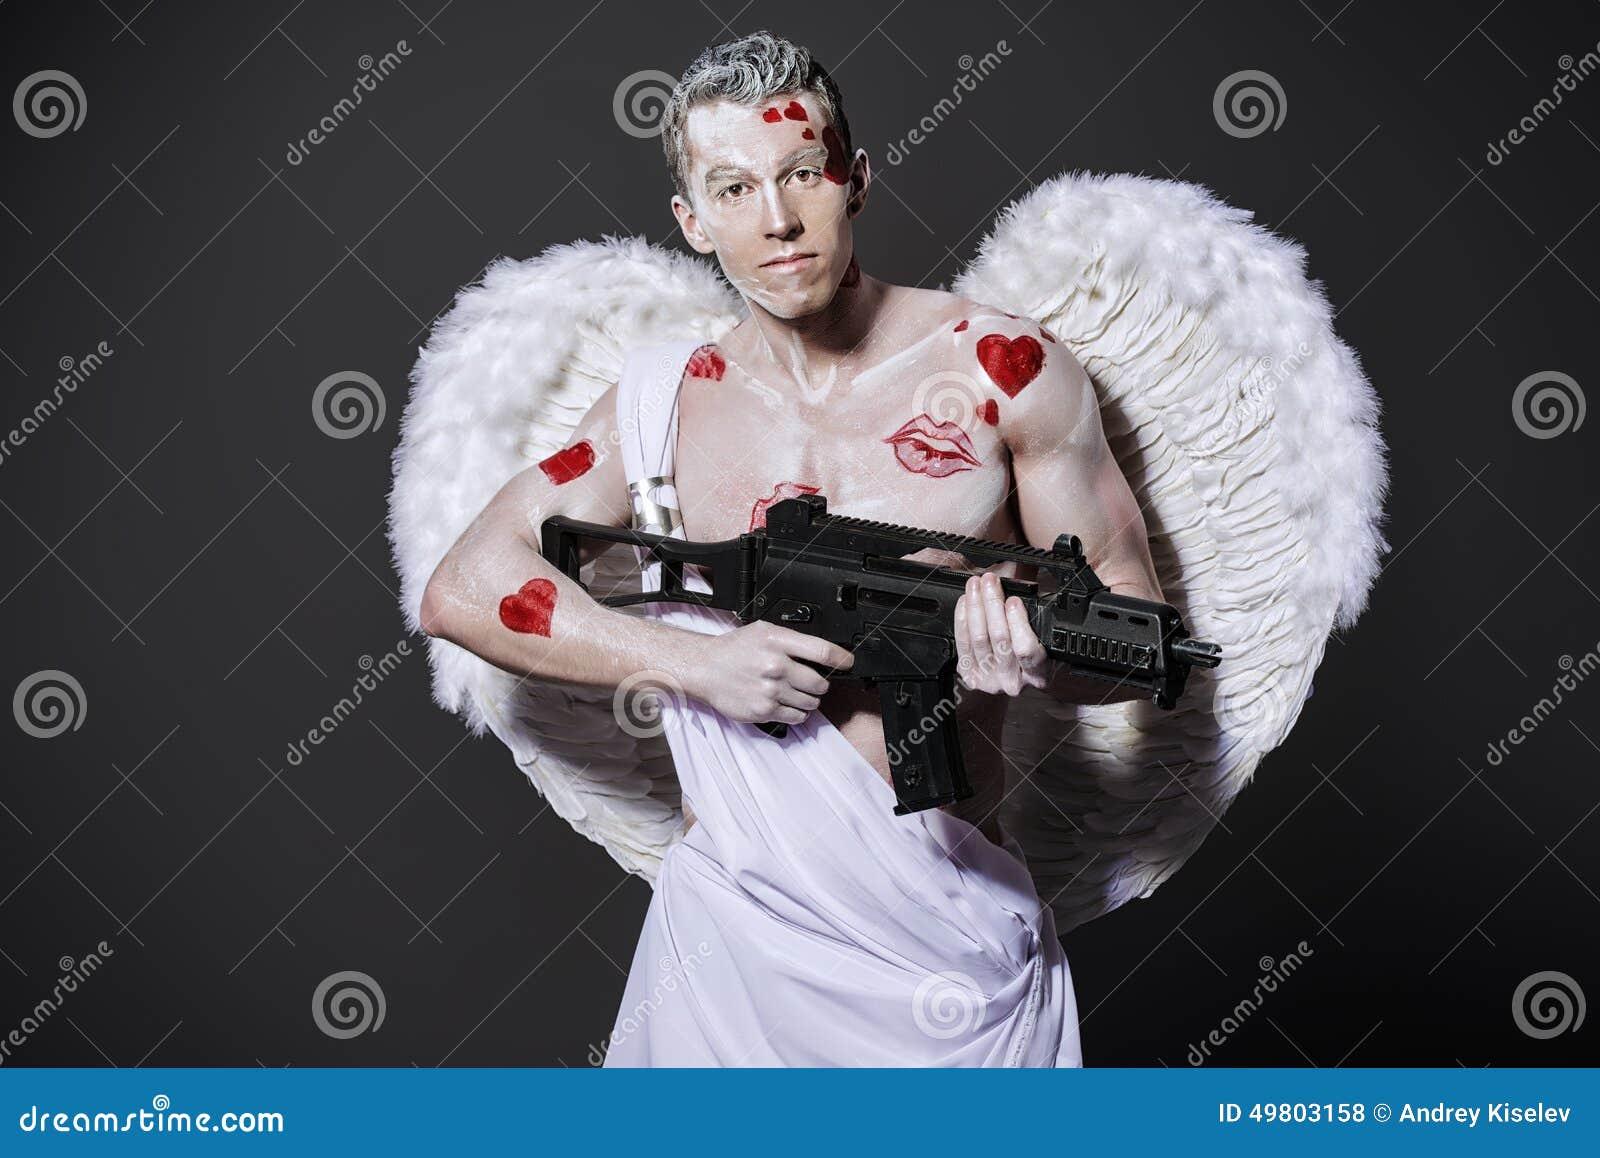 nude angel shot with arrow blood